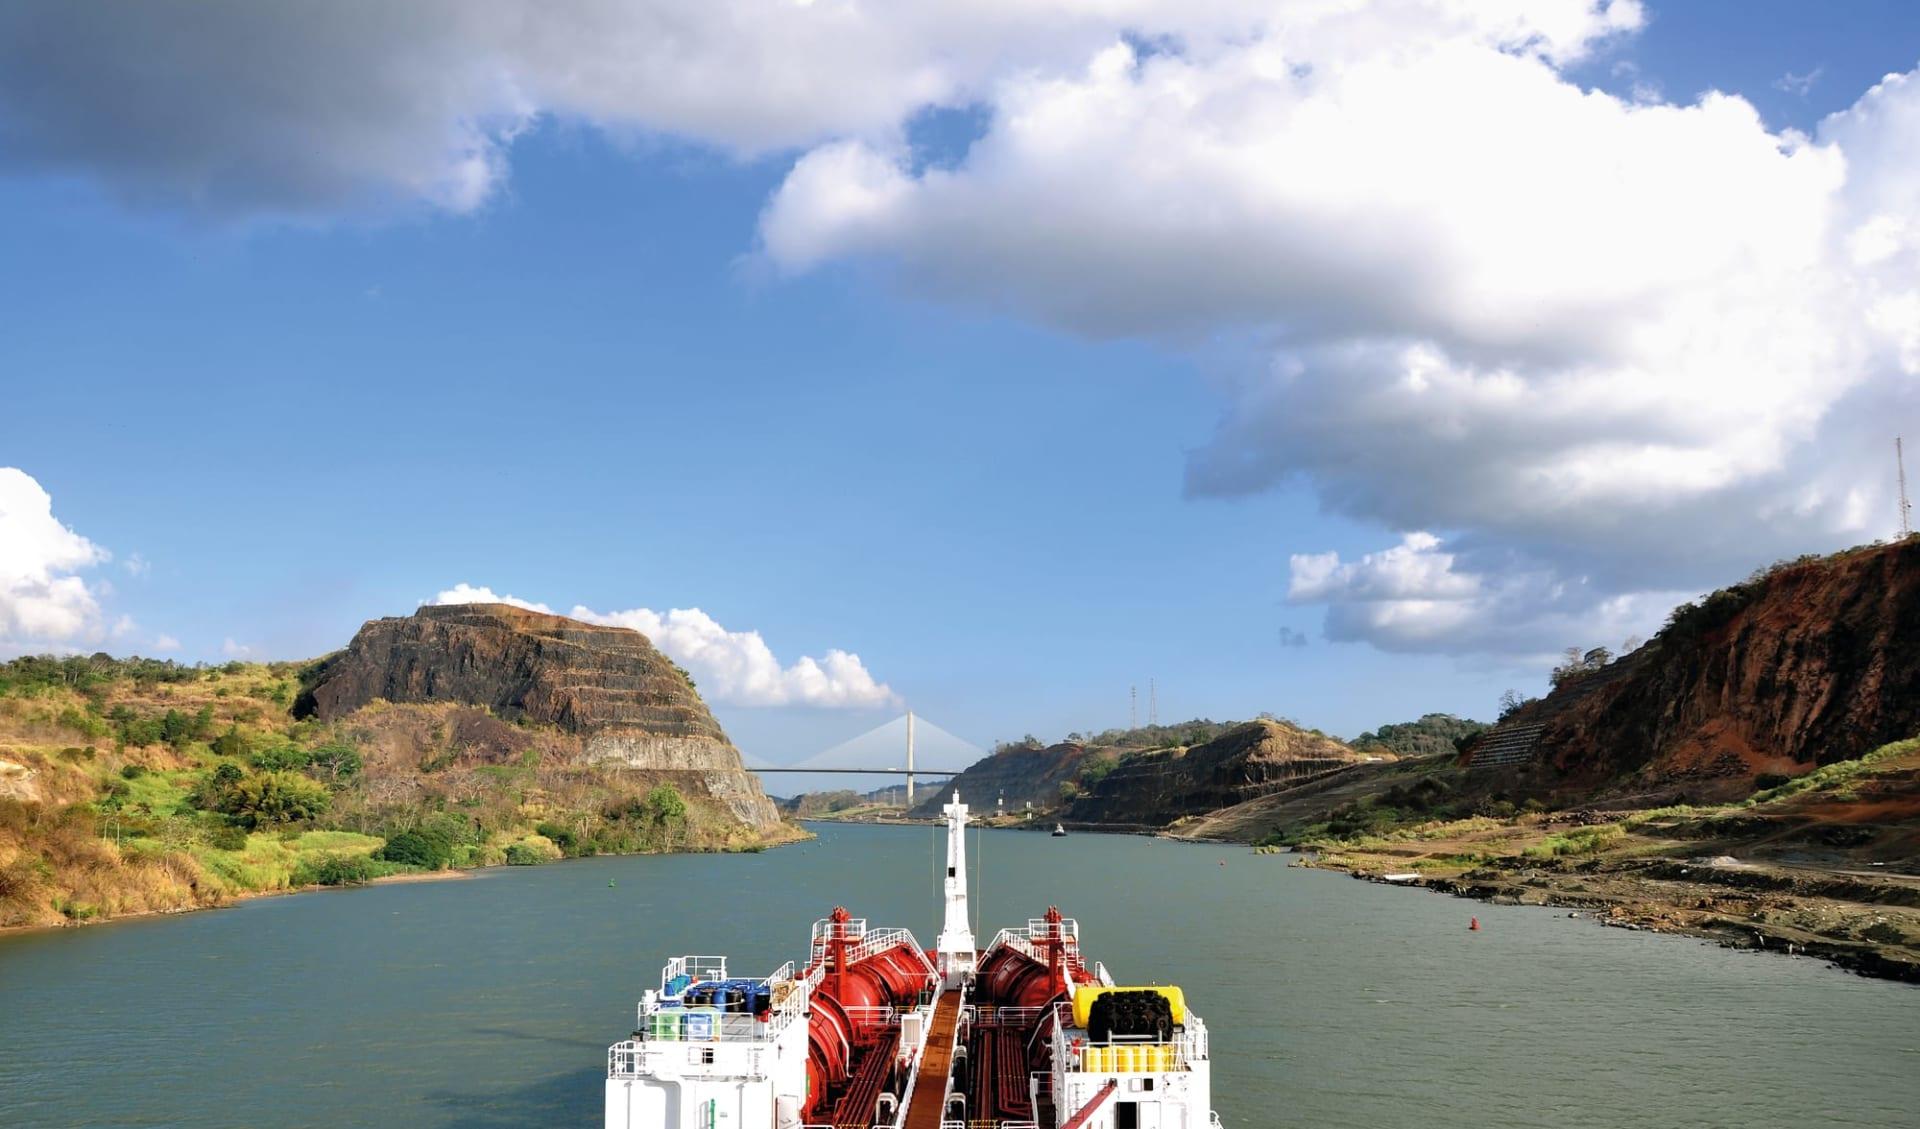 Privatreise Das Beste von Panama ab Panama City: Panama - FZ Schiff auf dem Panamakanal